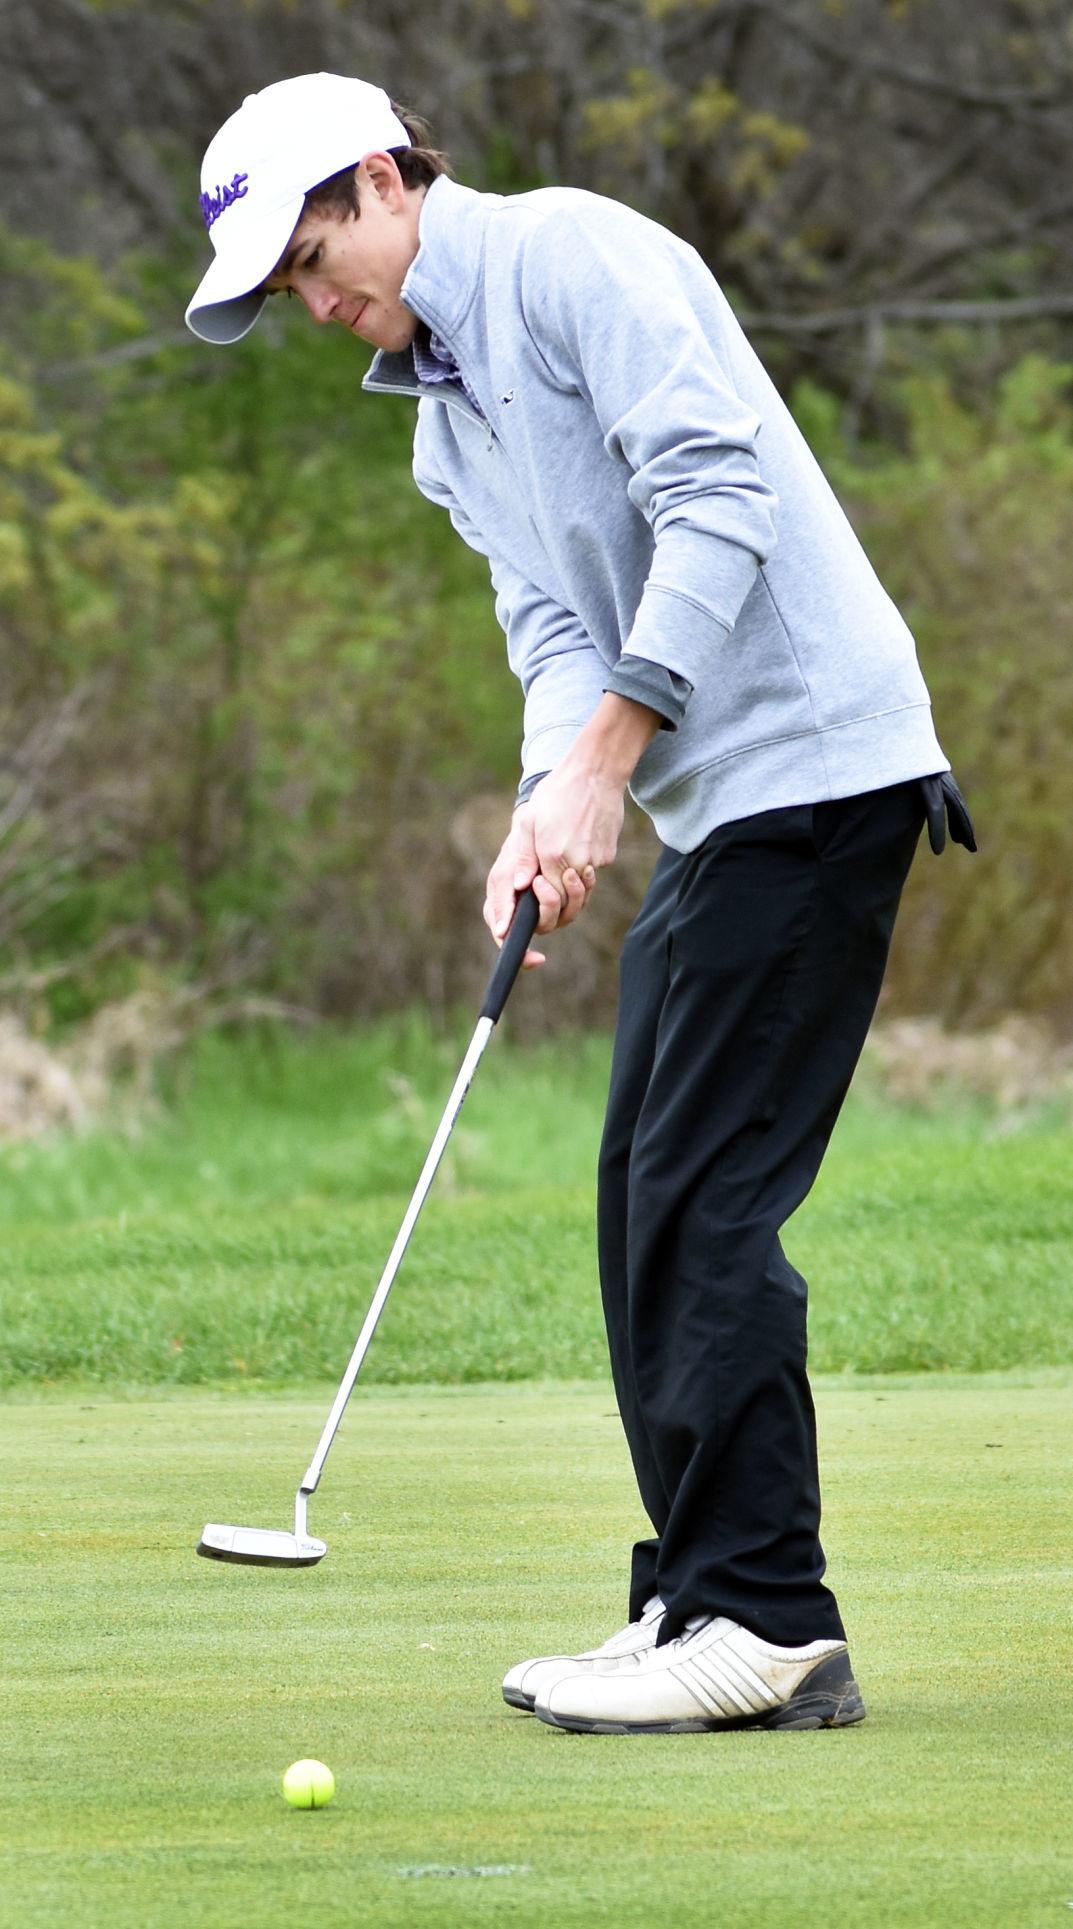 Prep boys golf photo: Waunakee's Sean Murphy